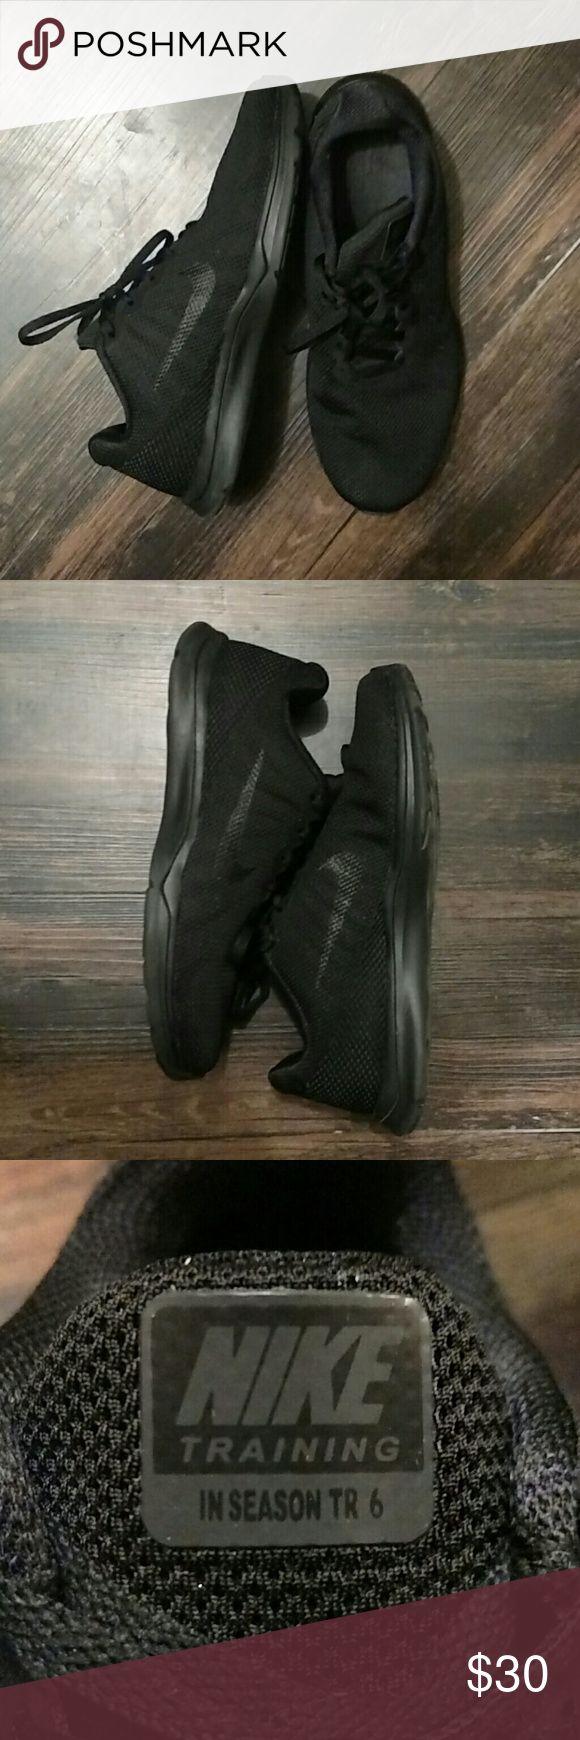 Nike Training shoe size 7.5 Black on black - Training In Season TR 6 Nike Shoes Athletic Shoes